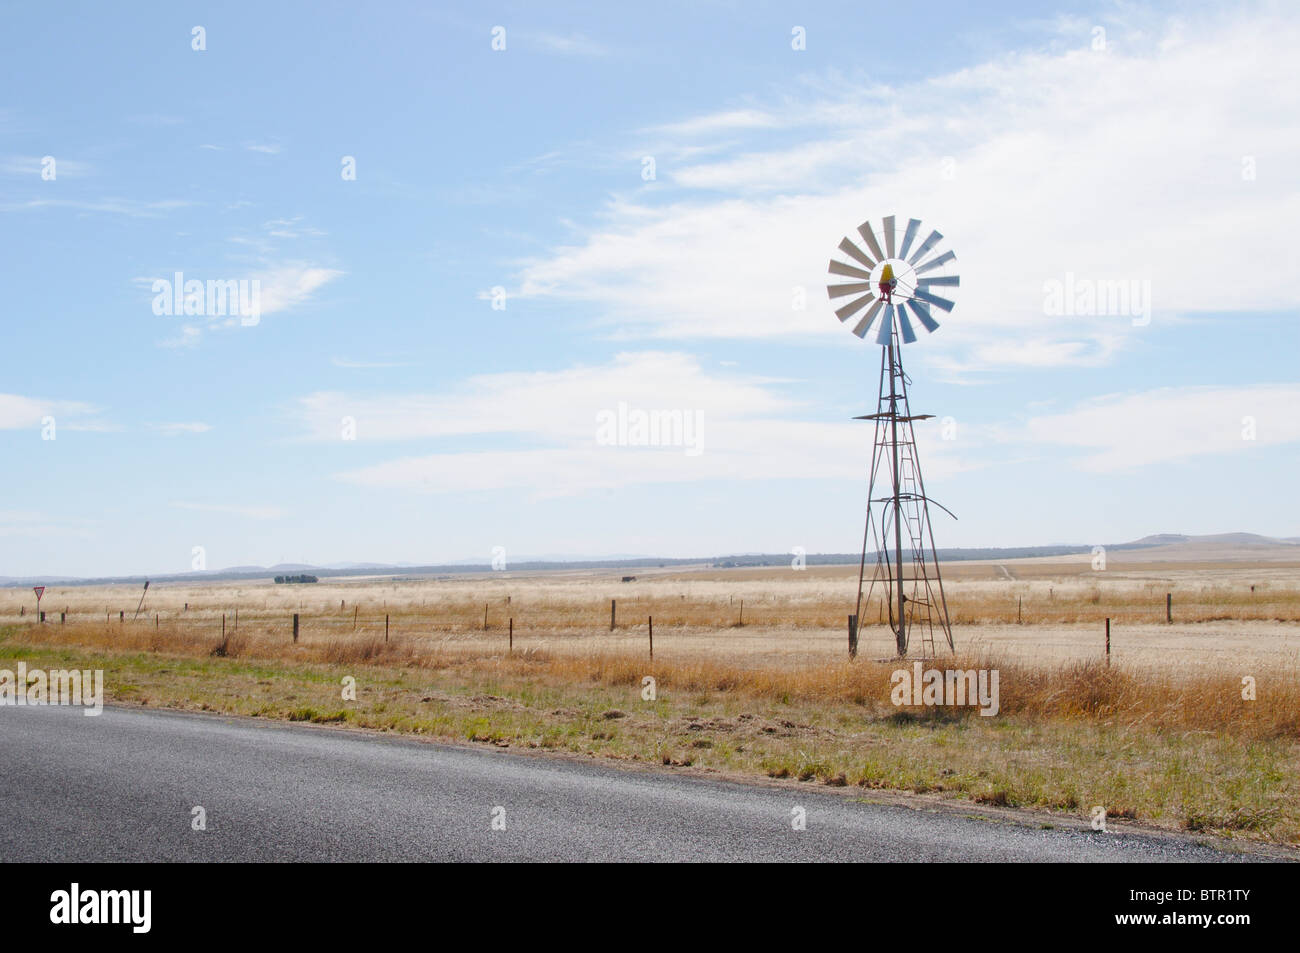 L'Australie, le Centre de Victoria, Glengower, Wind turbine Photo Stock